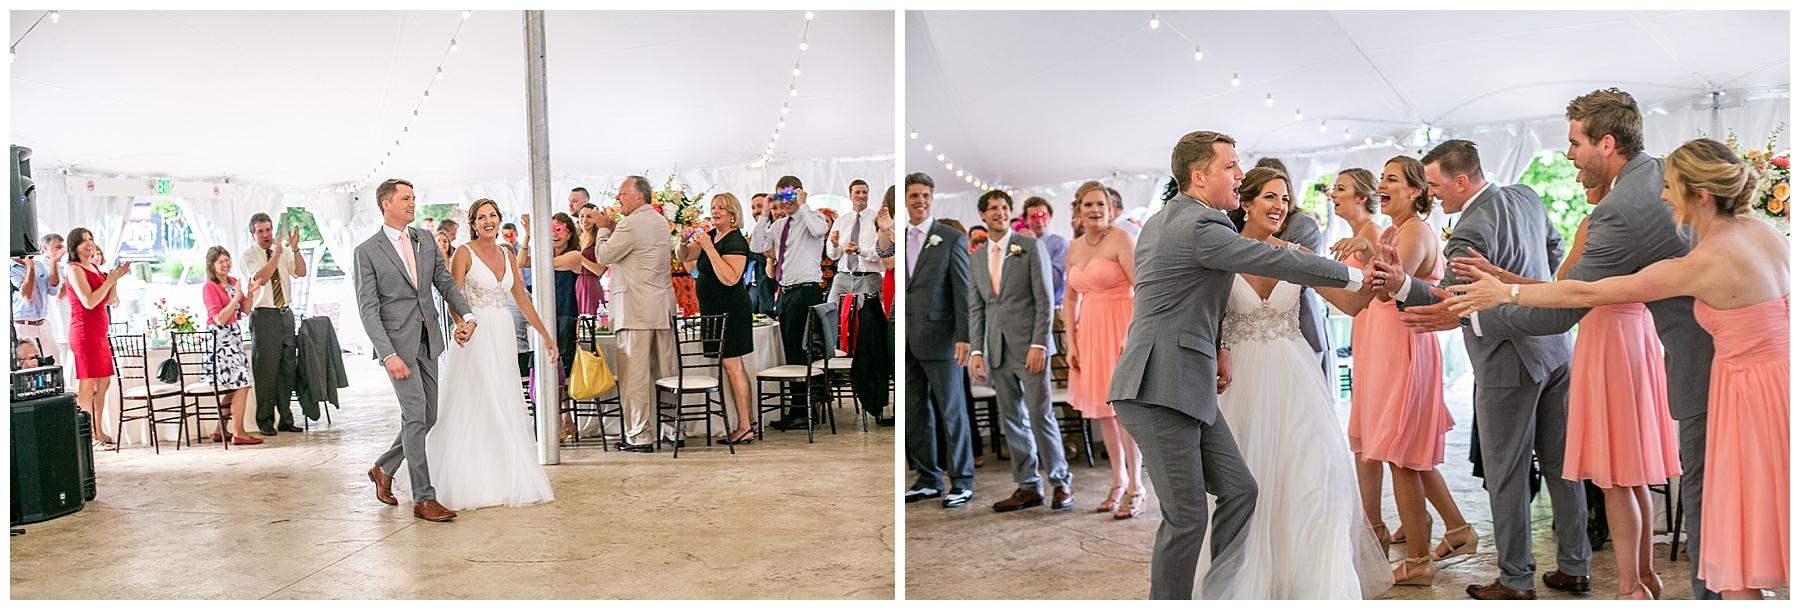 Chelsea Phil Bohemia River Overlook Wedding Living Radiant Photography photos_0131.jpg